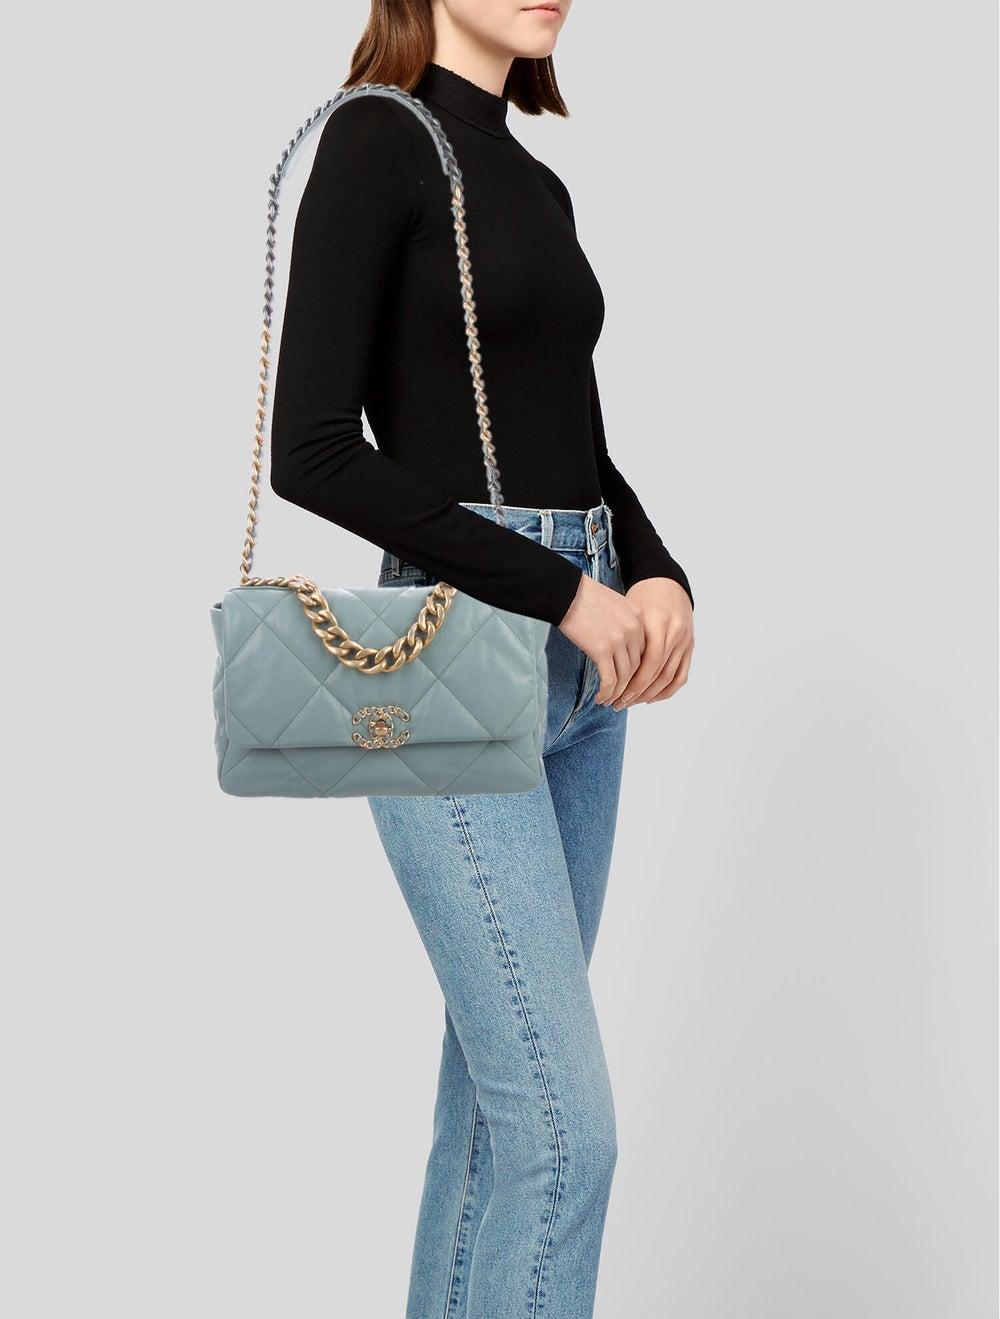 Chanel 2020 Large 19 Flap Bag Blue - image 2